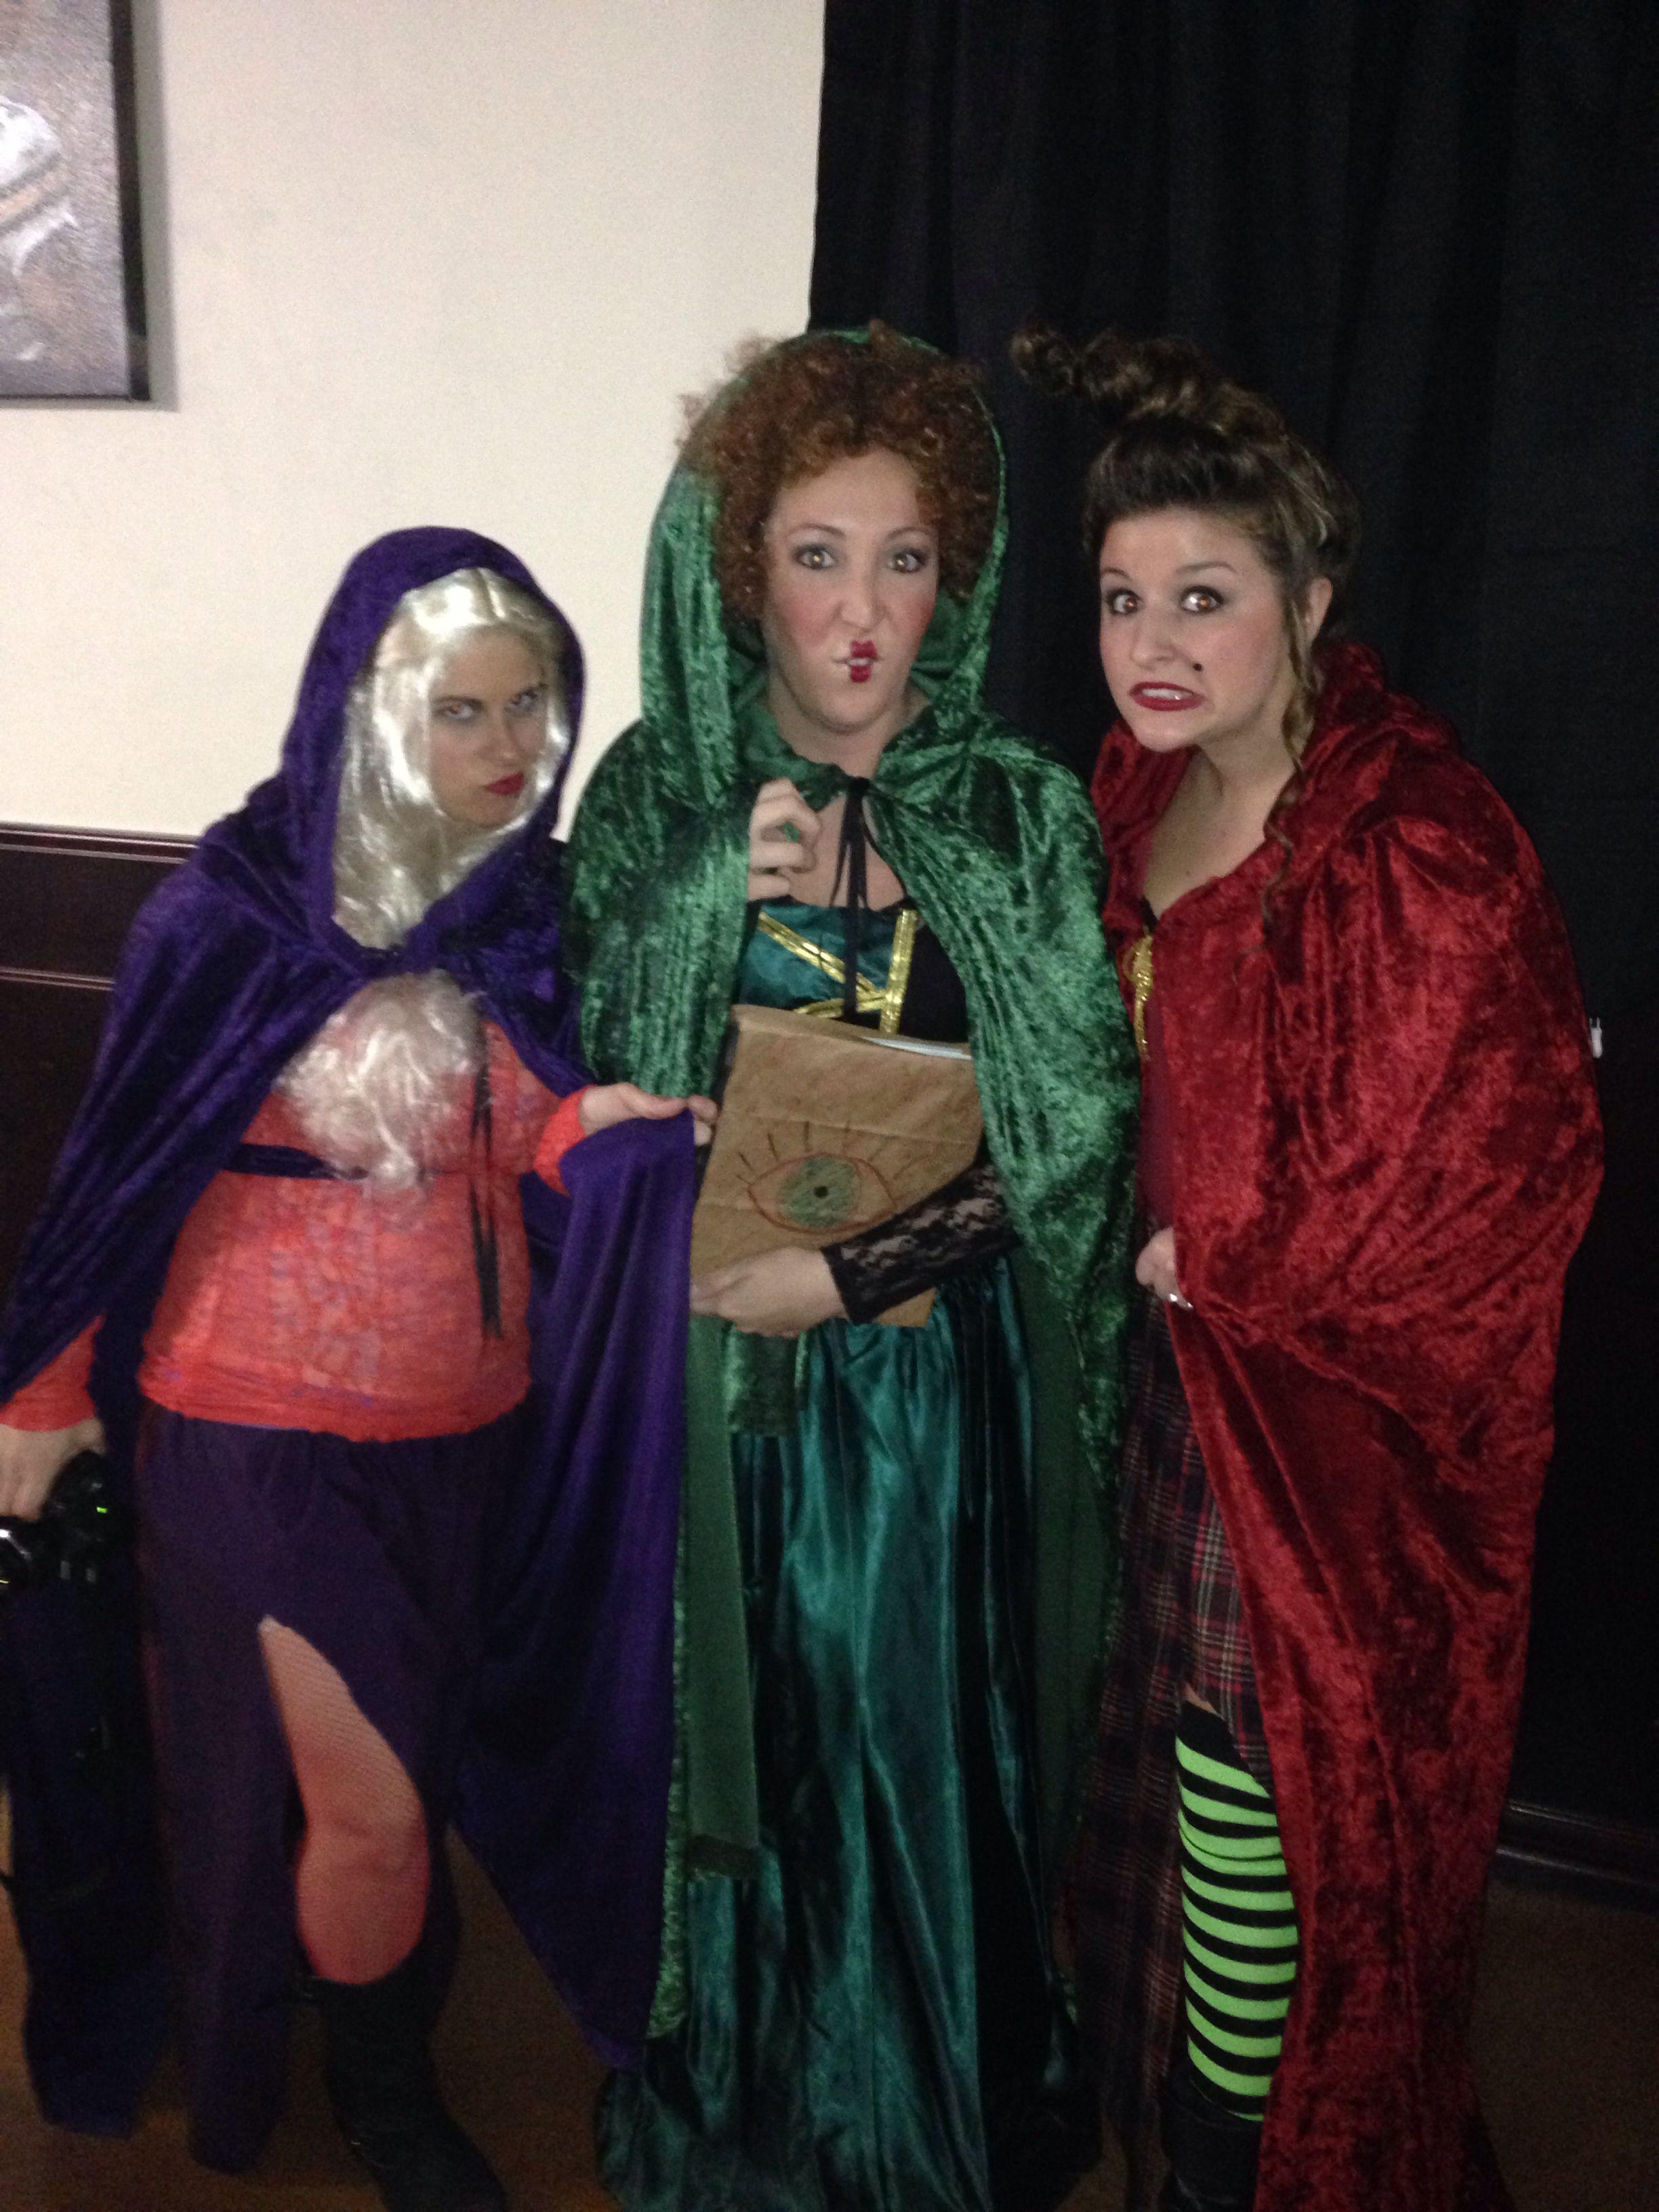 diy hocus pocus sanderson sisters, halloween costumes 2013